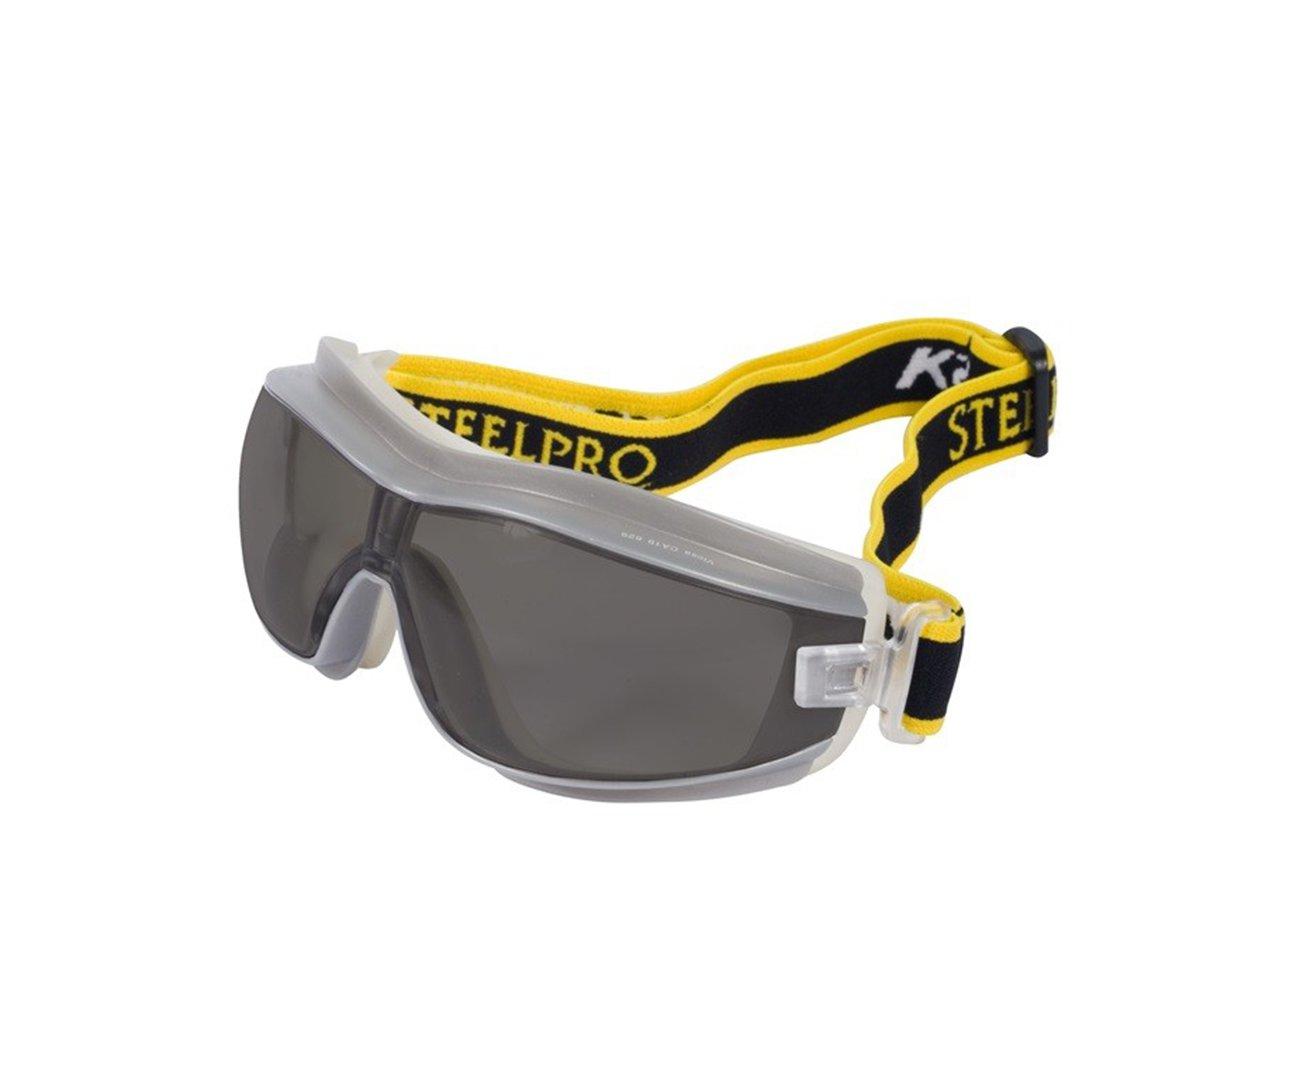 Oculos Proteção Airsoft Goggles Lente Cinza - Vicsa Safety